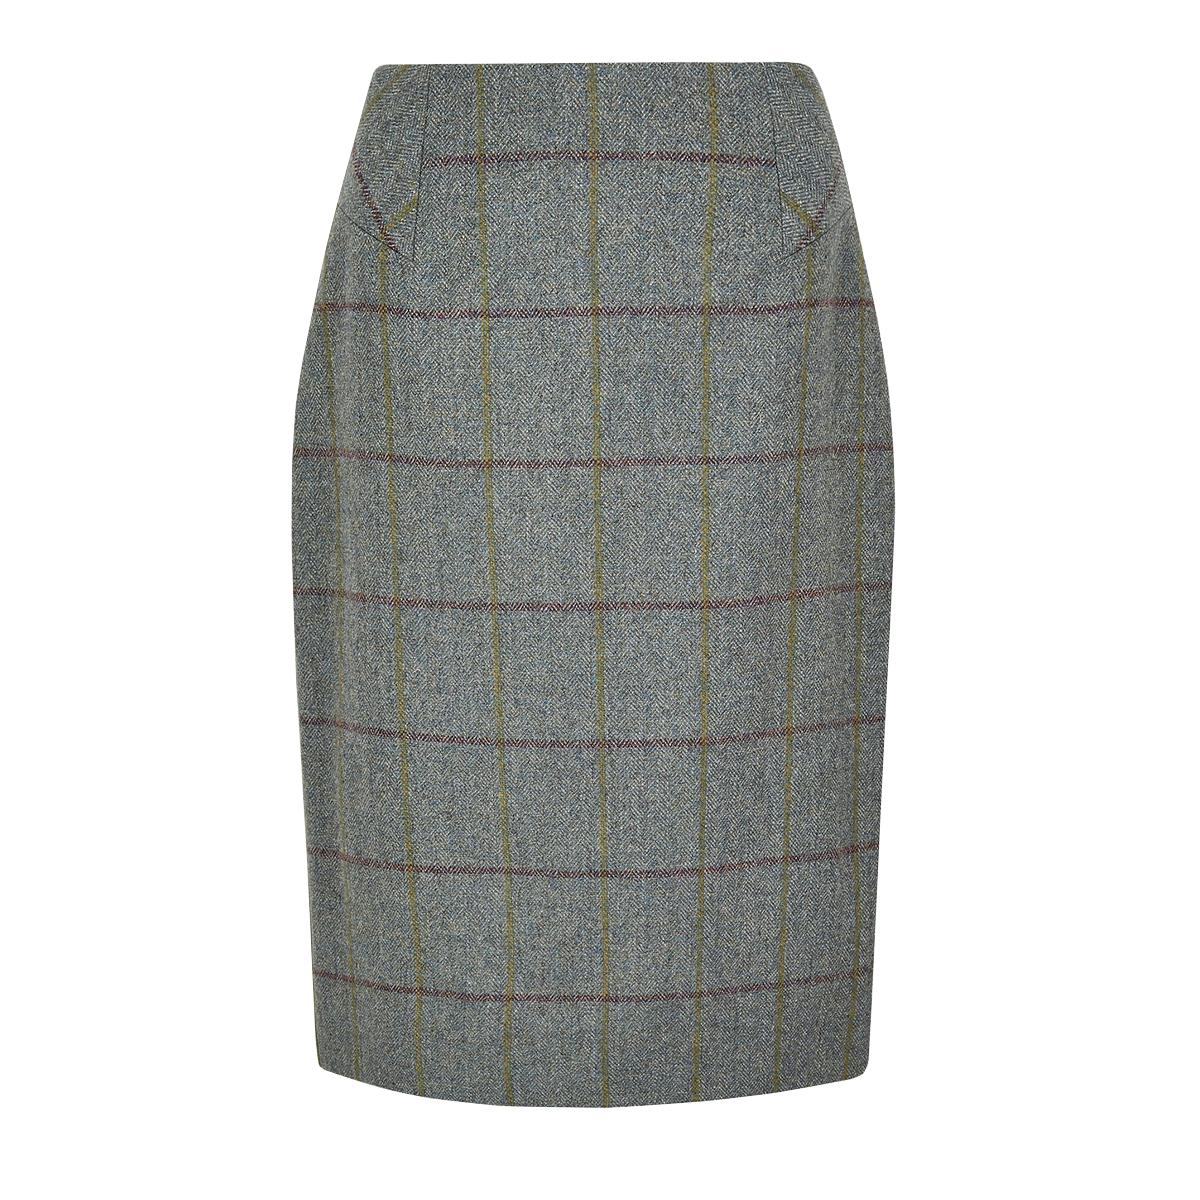 Dubarry-Fern-Sorrel-Tweed-Pencil-Knee-Length-Skirt